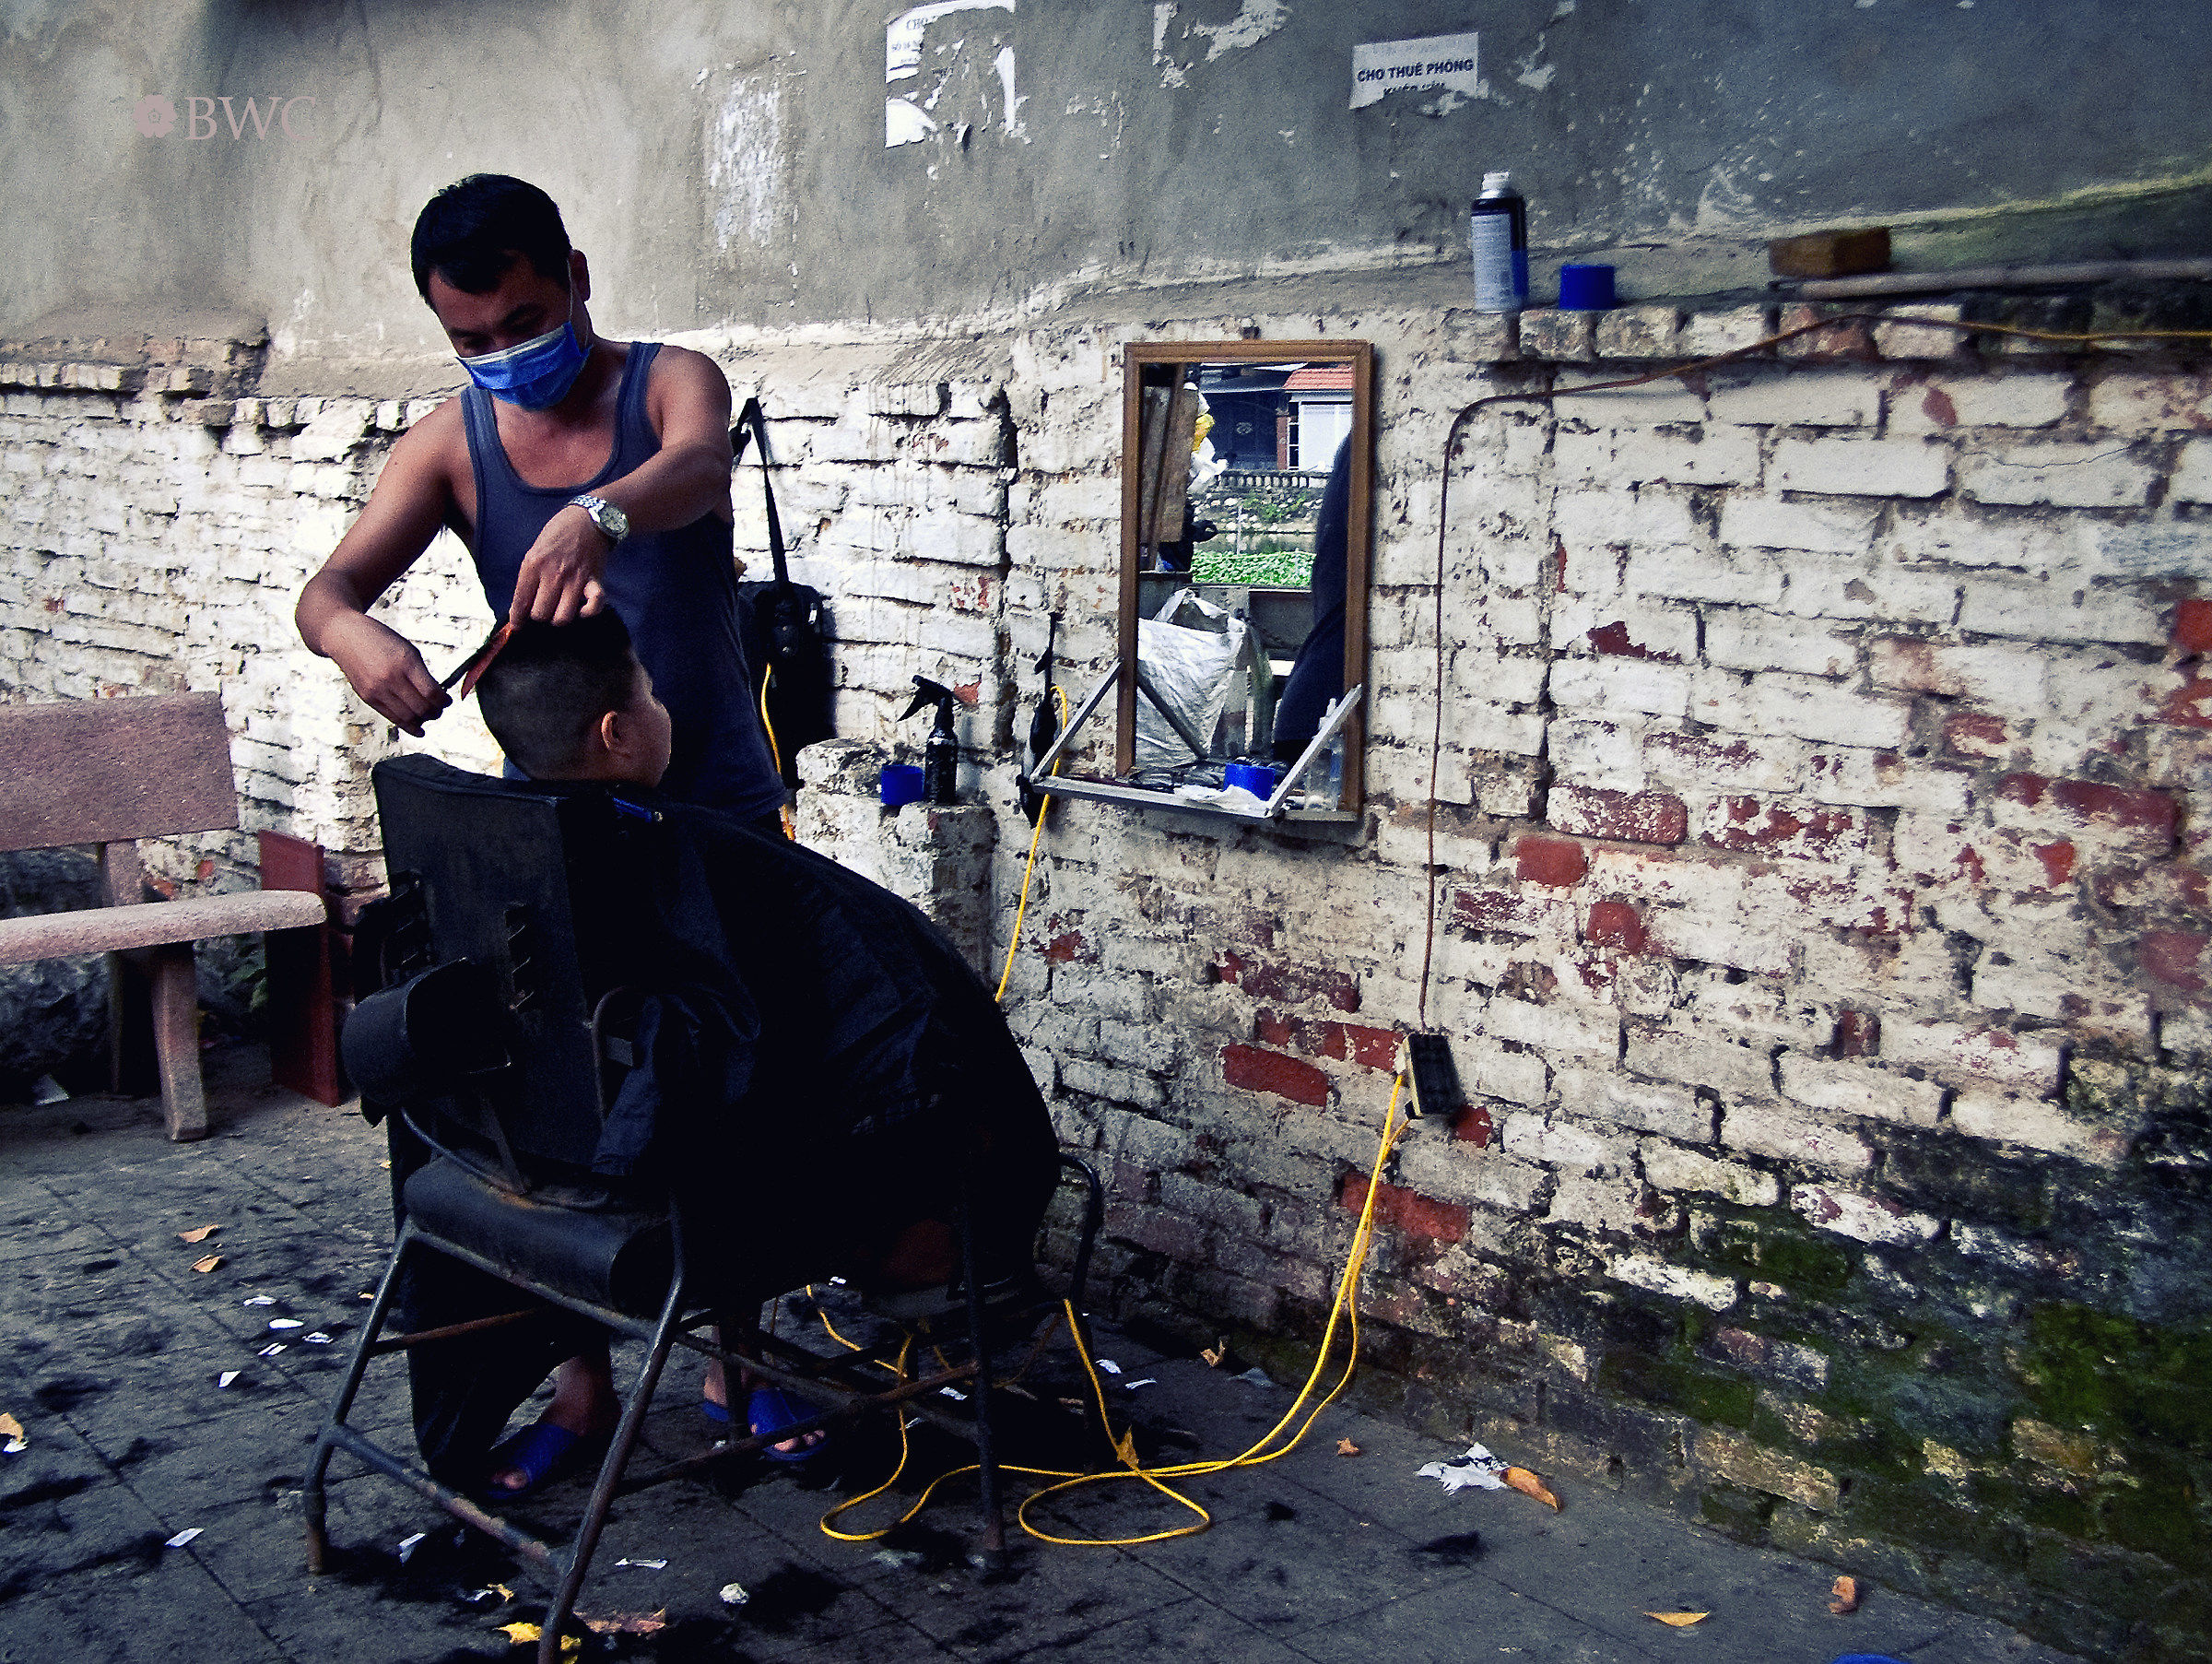 A Portable Barber Shop On The Sidewalk...